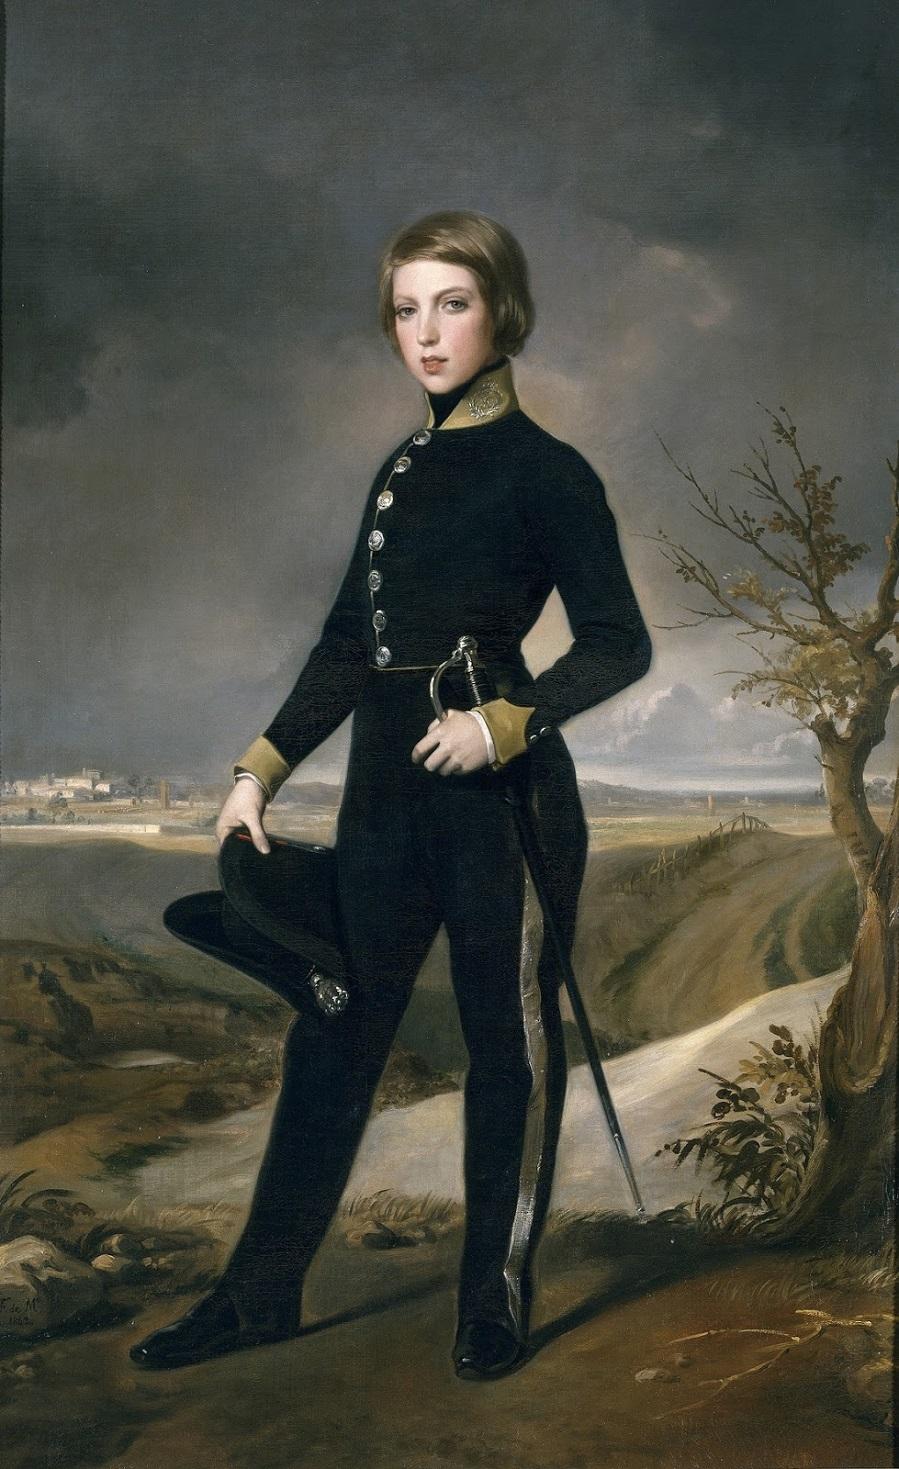 1842_Федерико Флорез (Federico Florez)_178 х 110_х.,м._Мадрид, музей Прадо.jpg